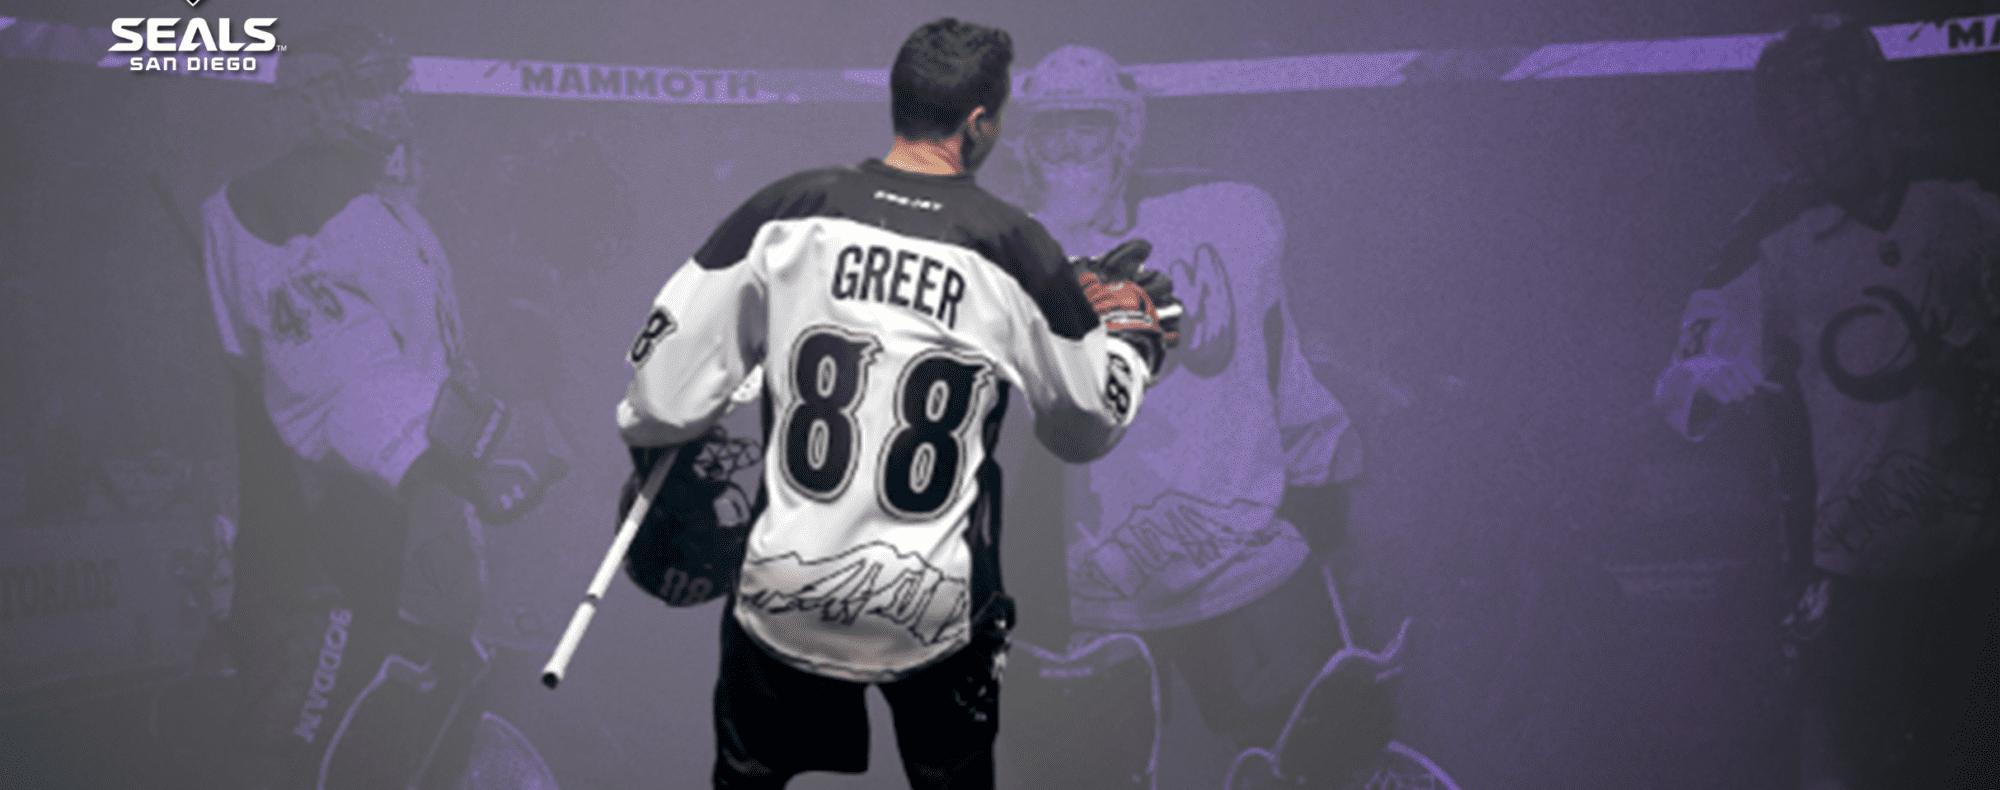 zack greer nll national lacrosse league san diego seals pro lacrosse box lacrosse